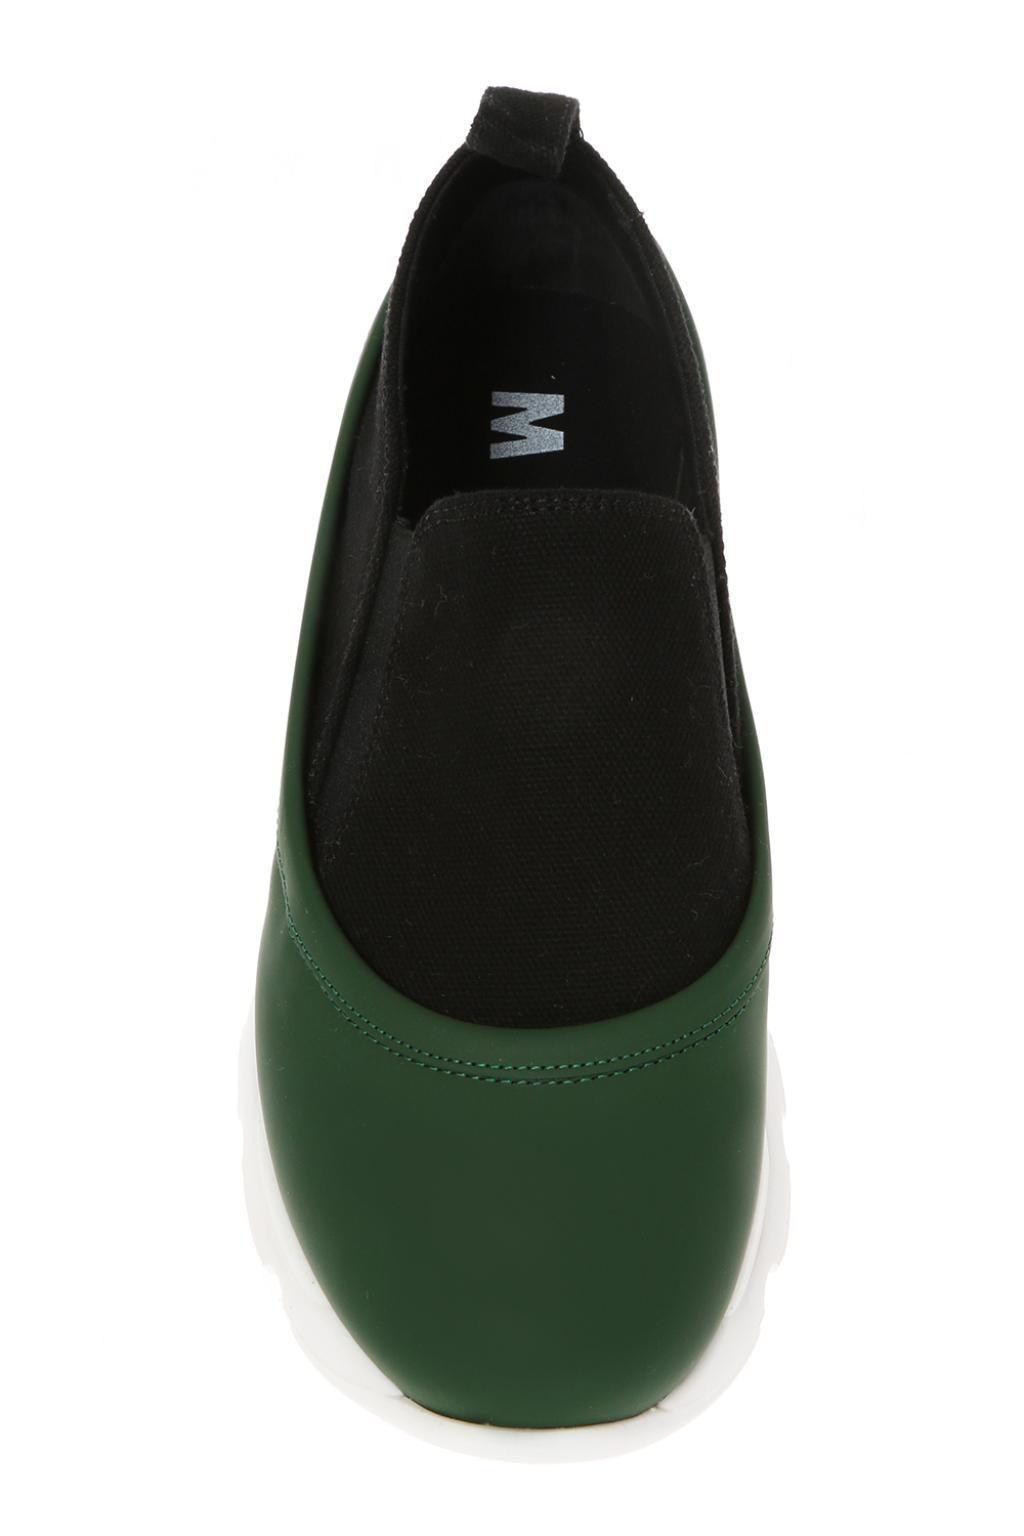 Marni Leather-trim Sneakers in Black